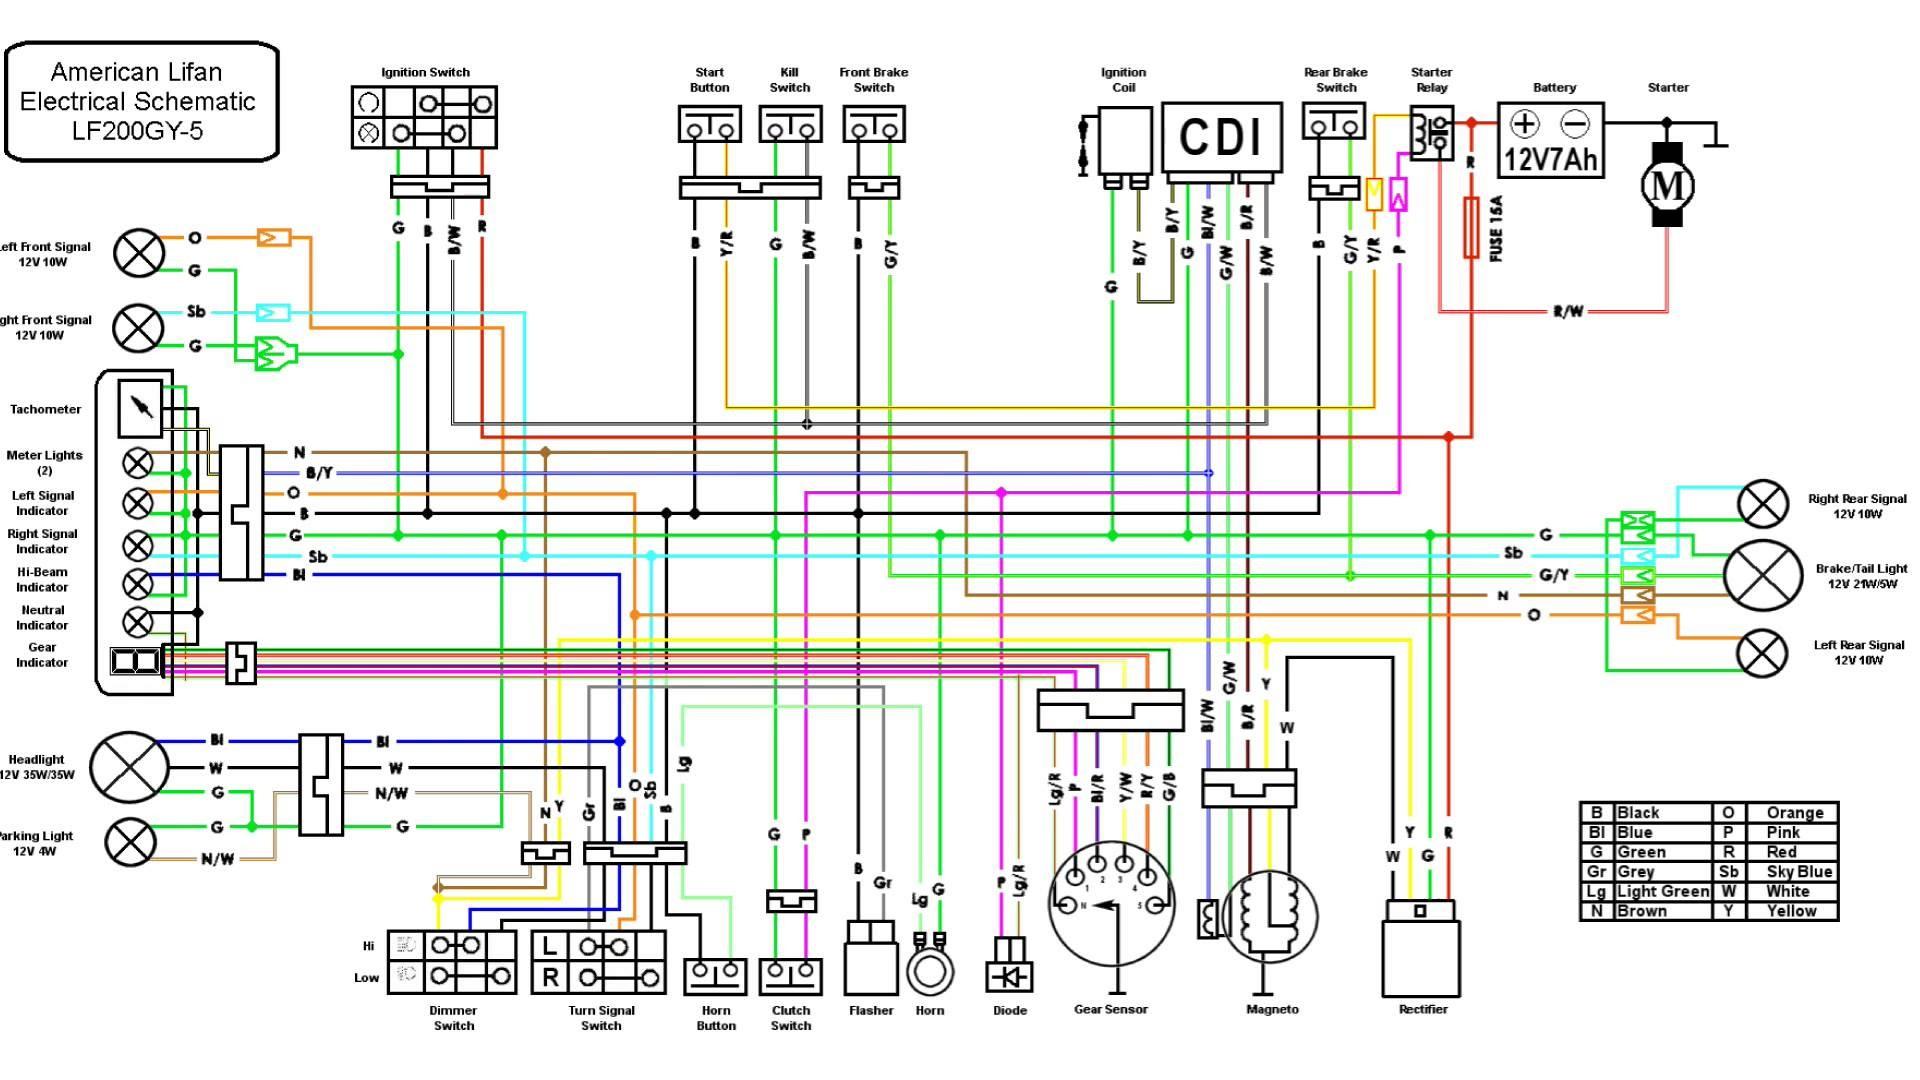 Xrm 125 Engine Diagram Honda Xrm Wiring Diagram Honda Xrm Wiring Diagram Electrical Of Xrm 125 Engine Diagram